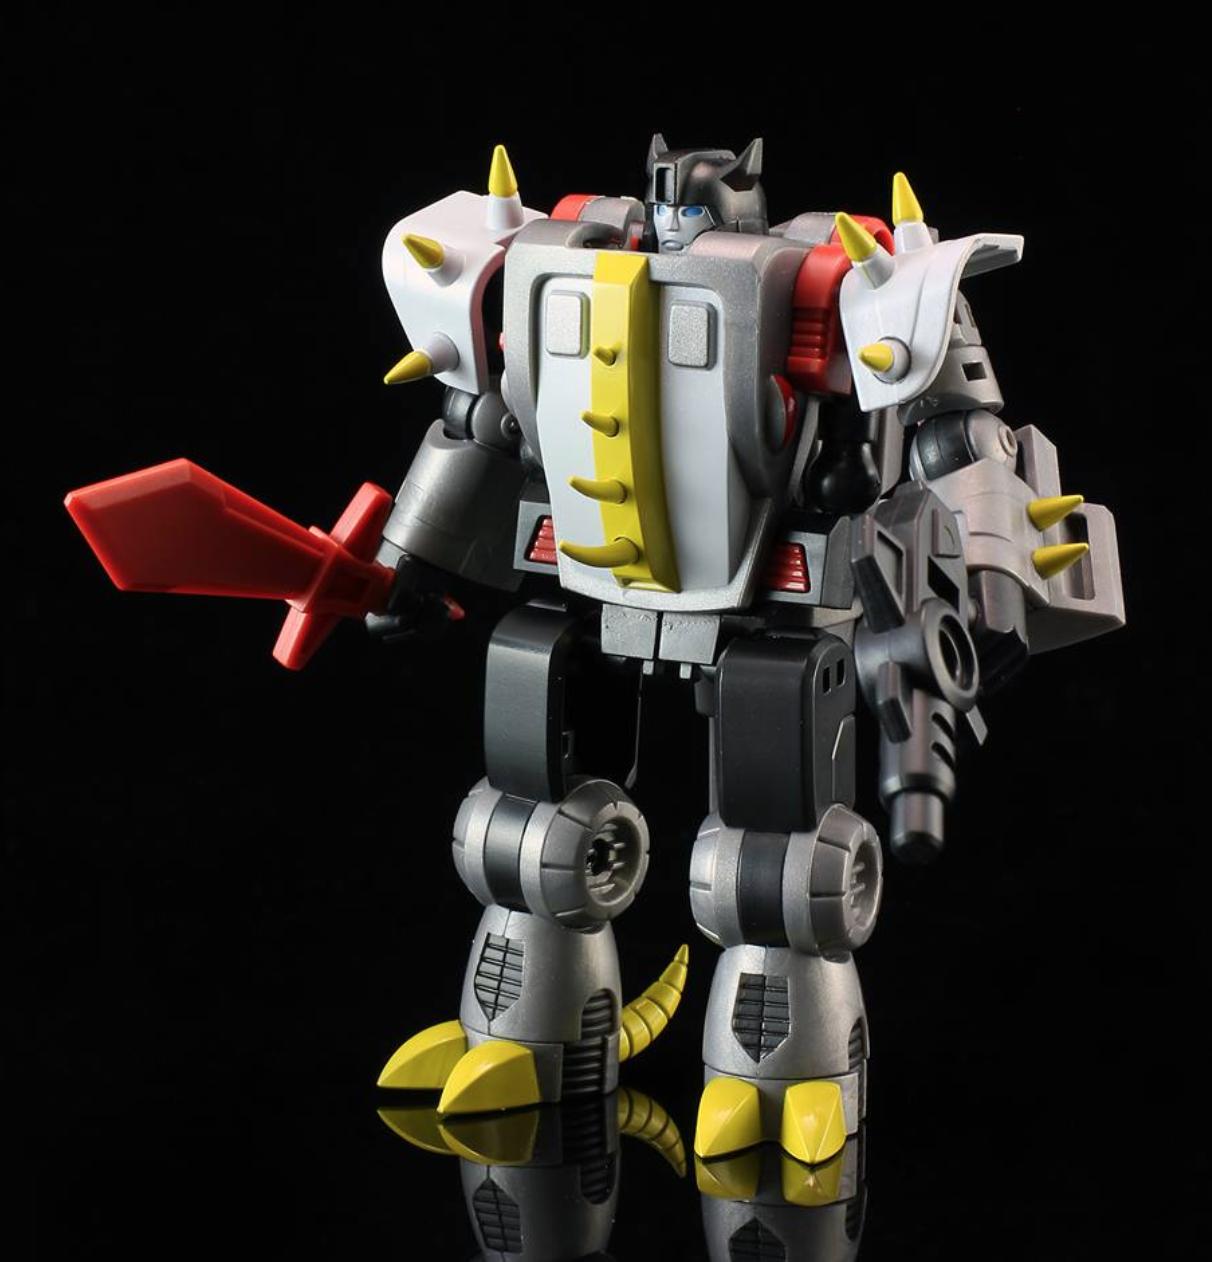 Transformers TFCON 2016 Exclusive CV-002S Dinobot Corbot V Savage Alicon